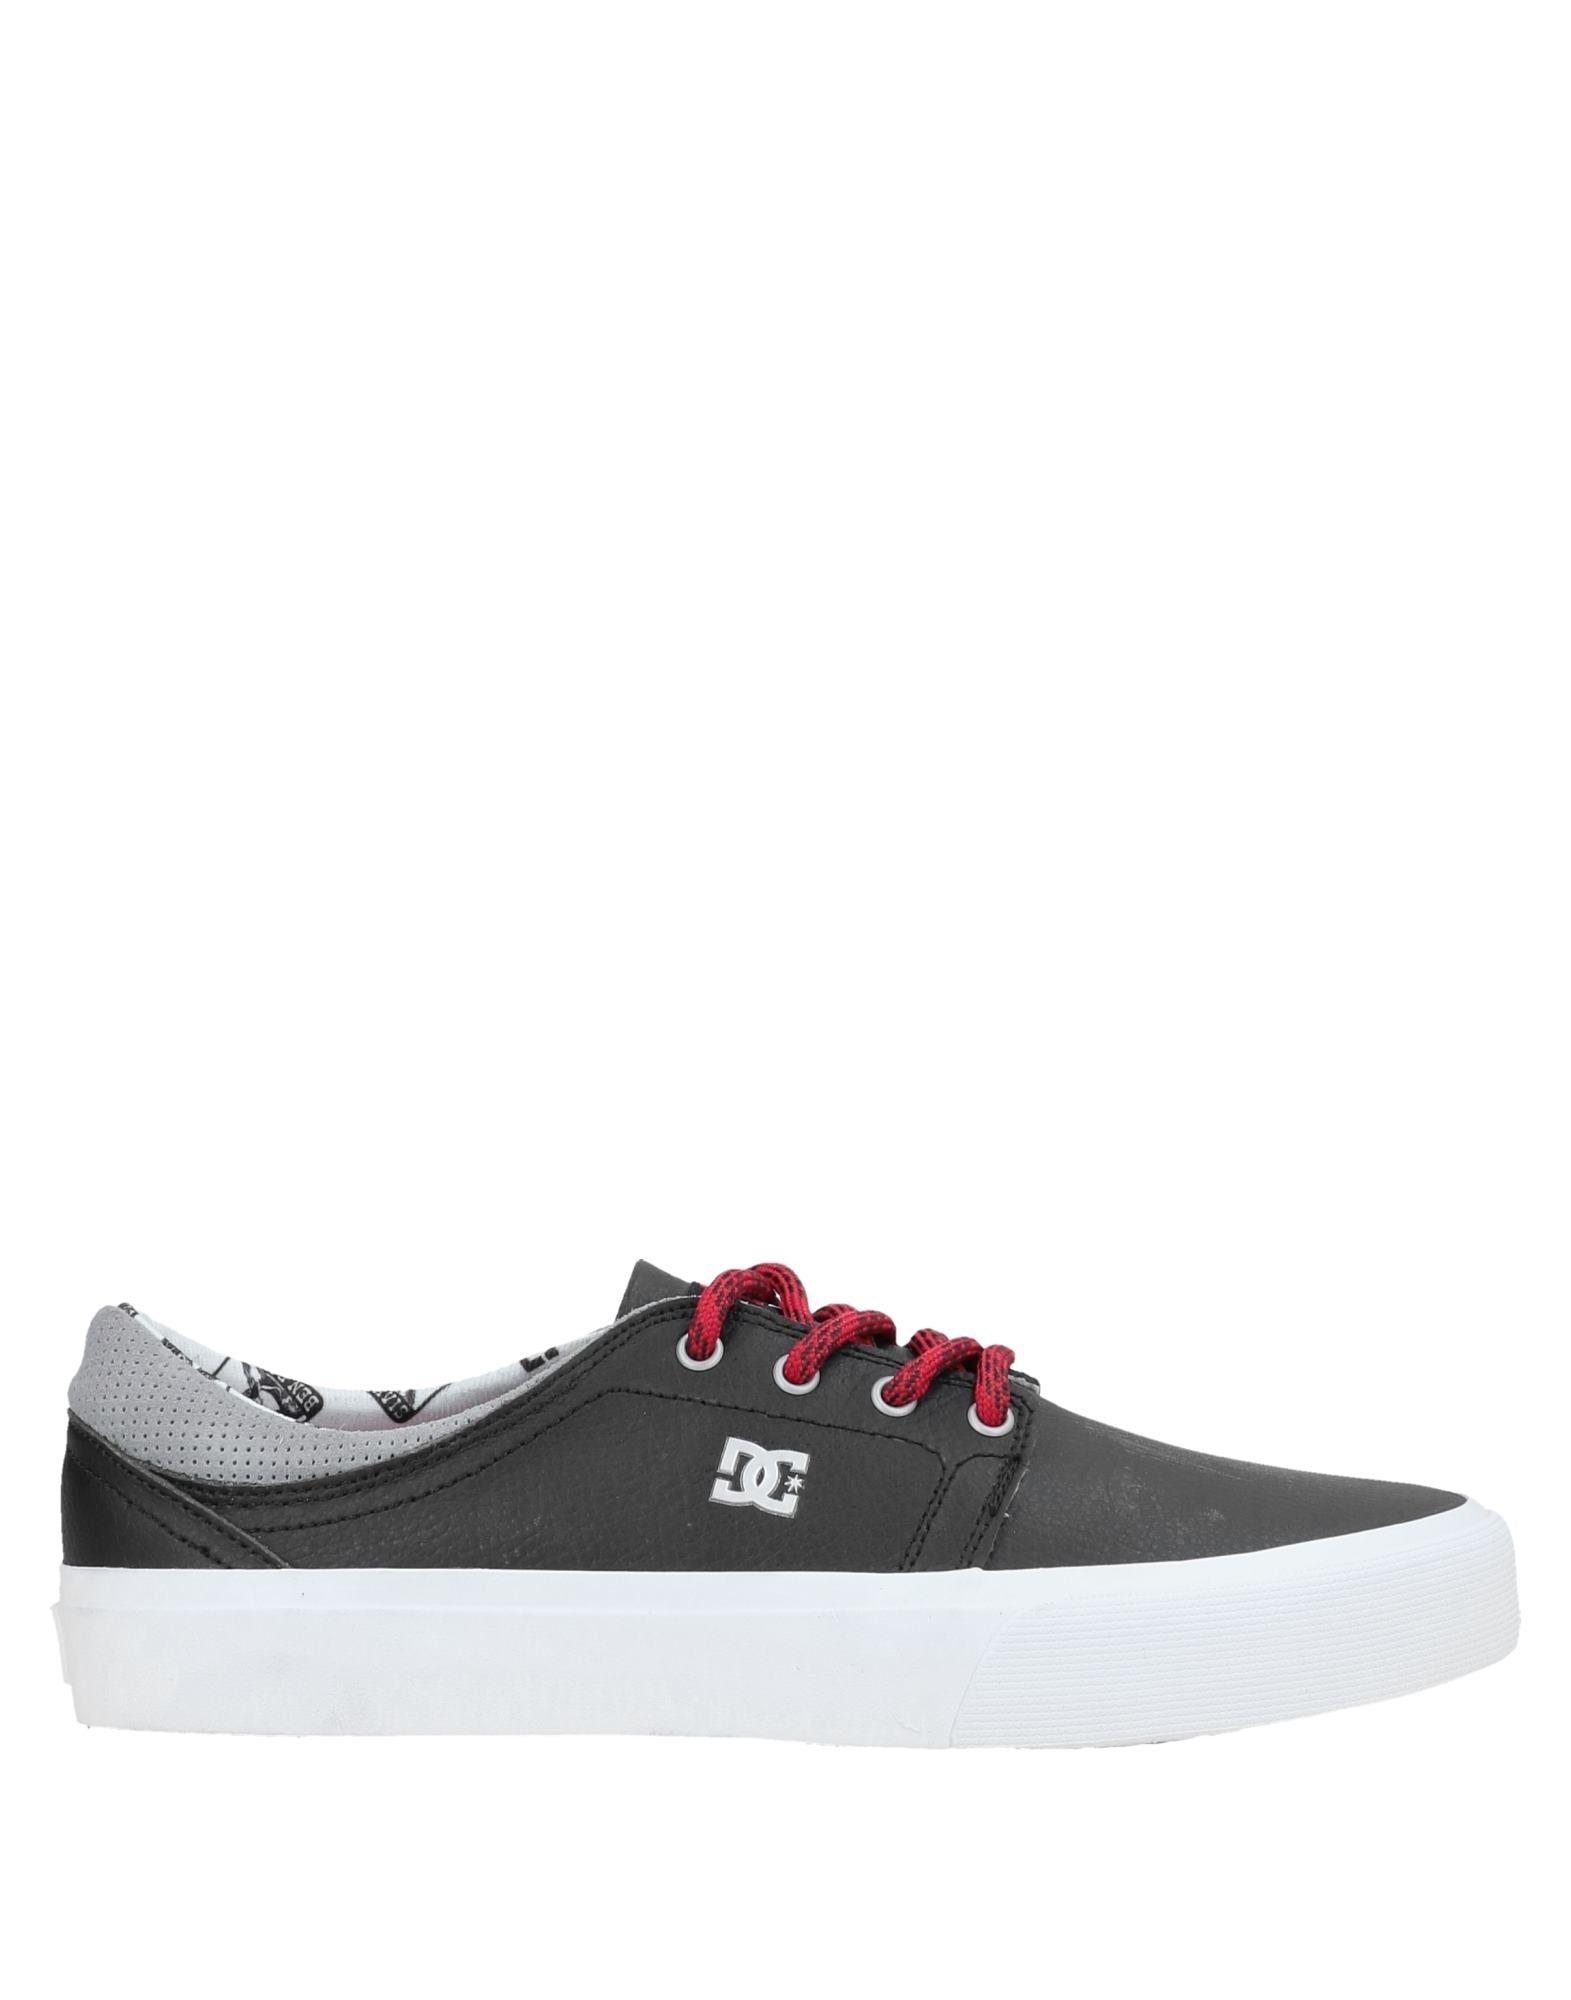 Dc Shoecousa Shoecousa Sneakers - Men Dc Shoecousa Shoecousa Sneakers online on  United Kingdom - 11573187PH 230b88